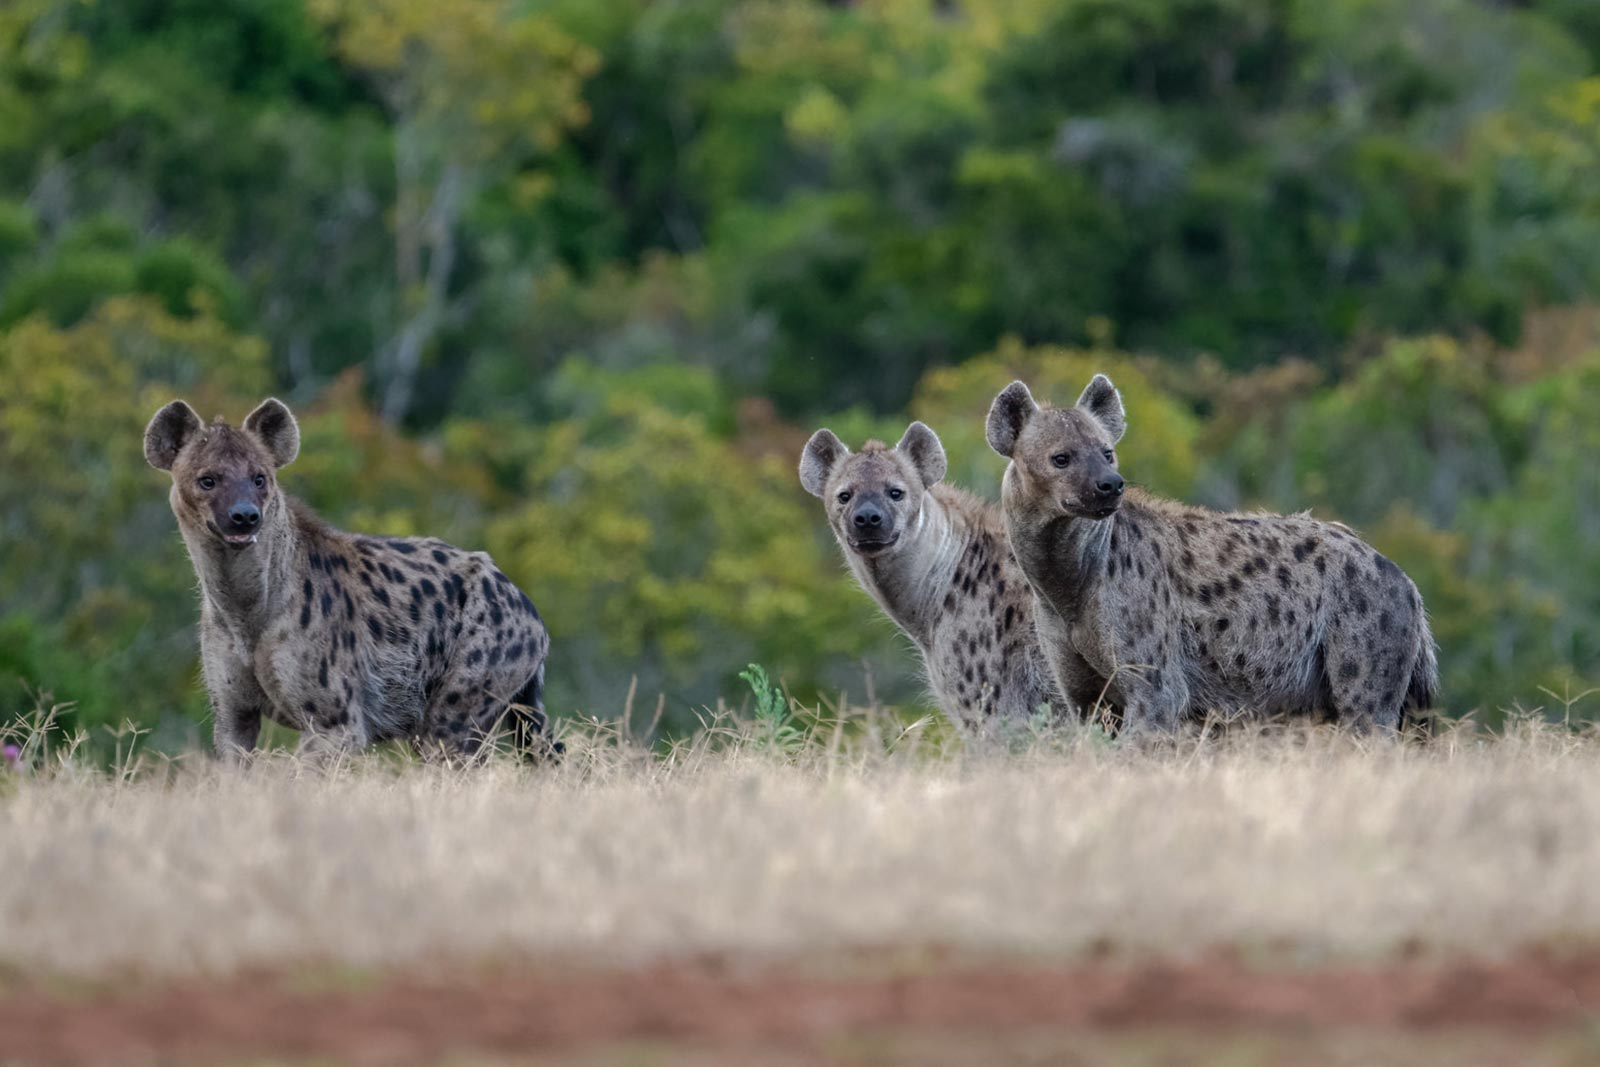 Spotted Hyena (Crocuta crocuta) in Uganda